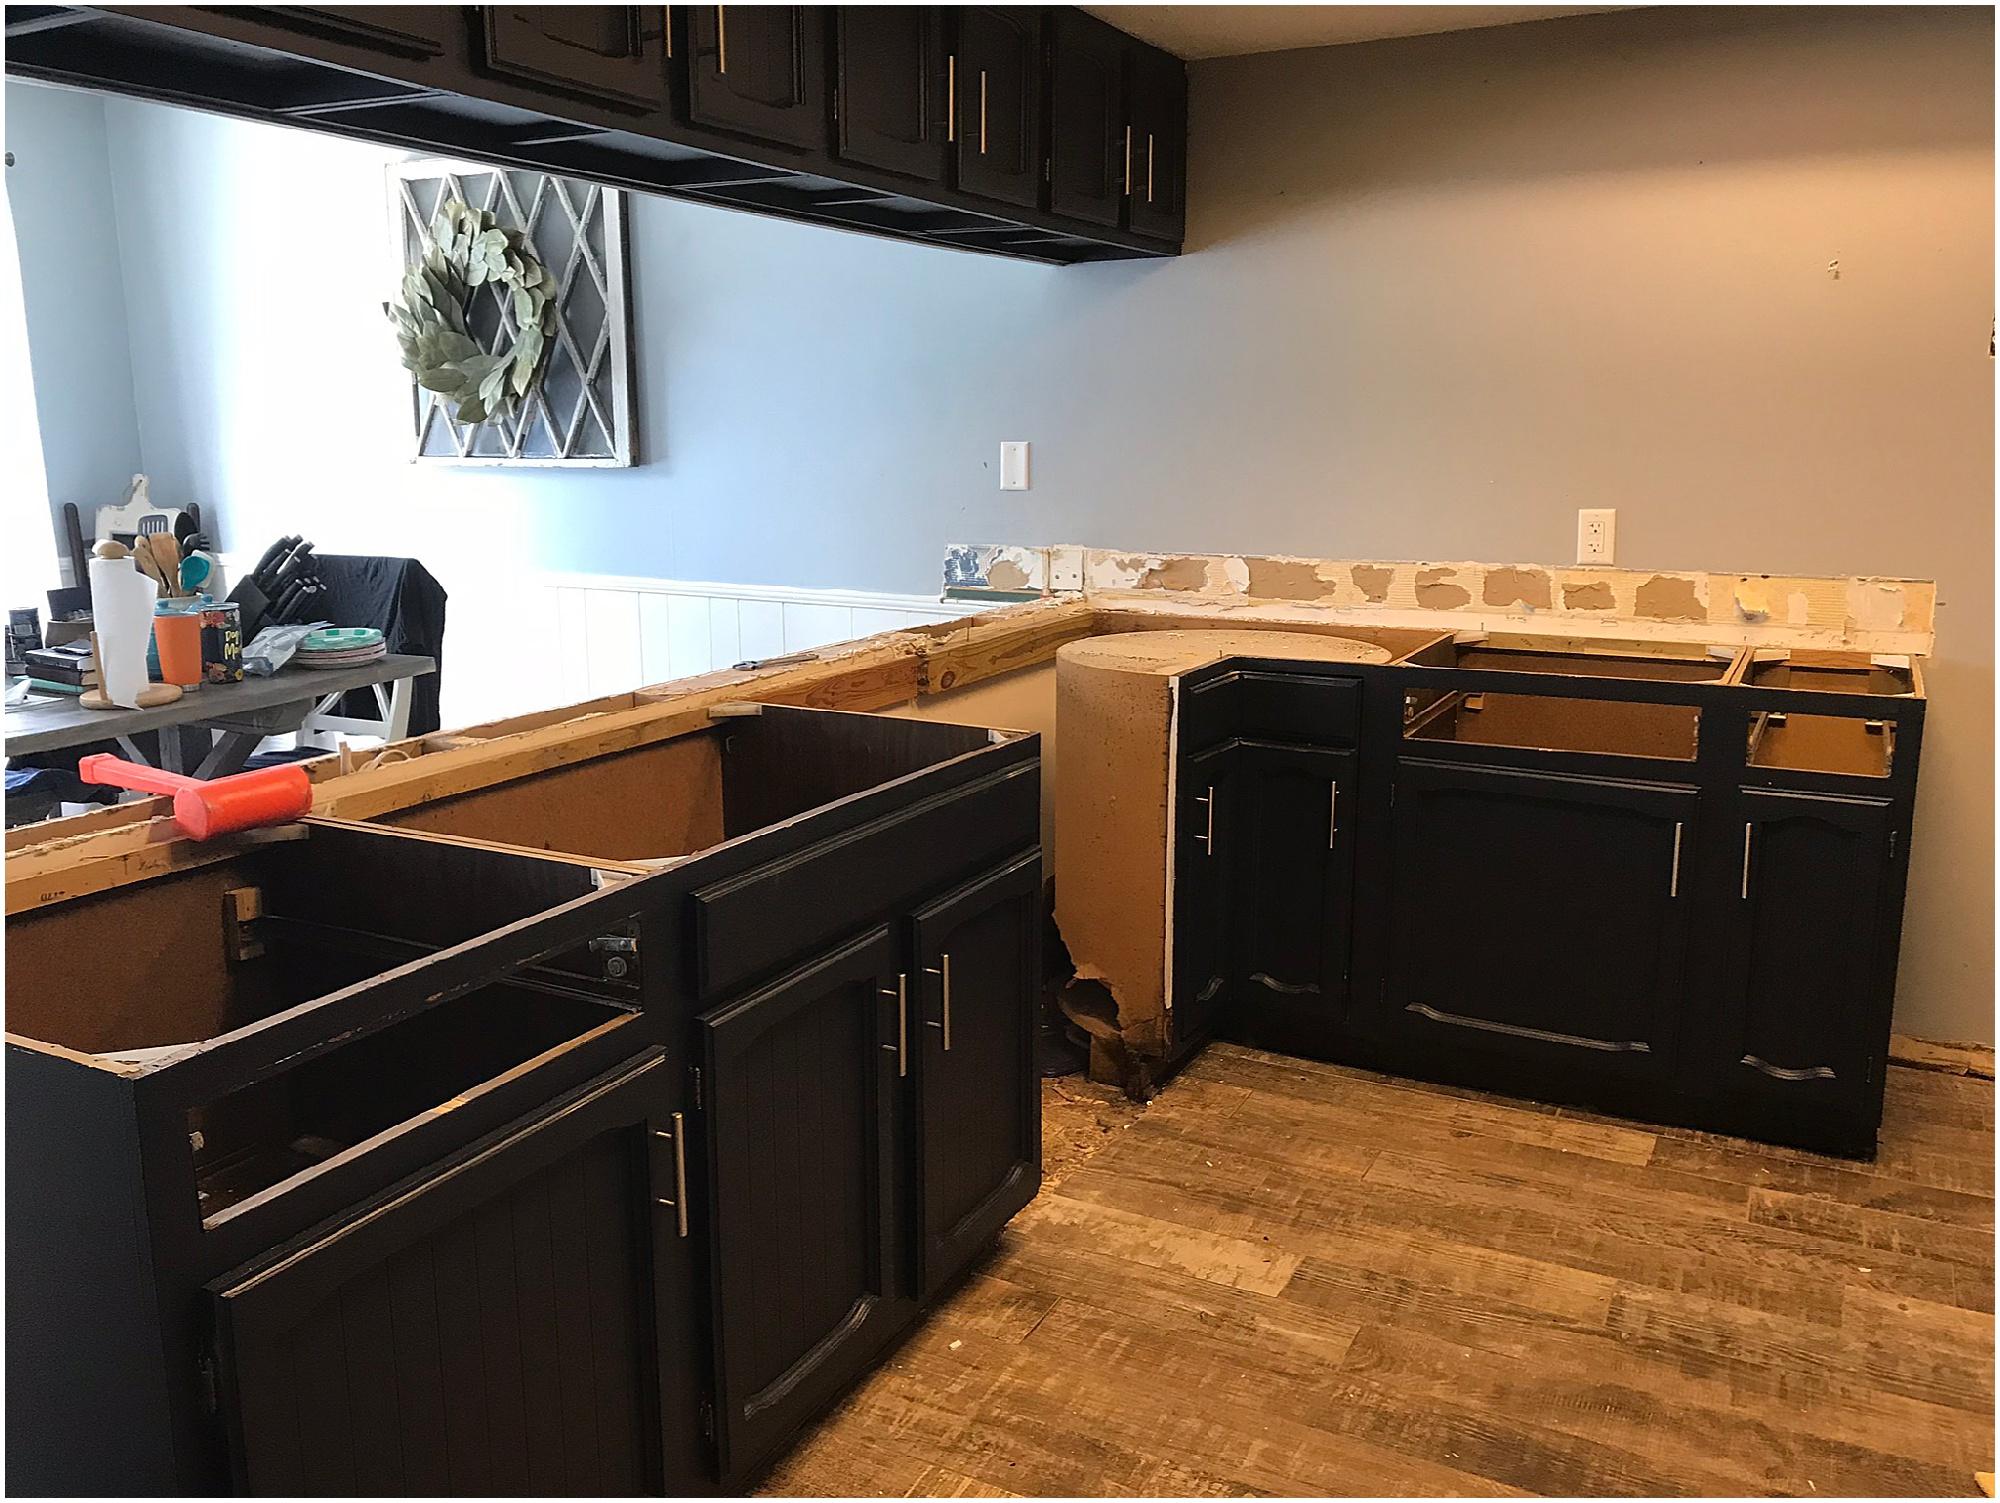 hambick-house-kitchen-renovation-fixer-upper_0008.jpg